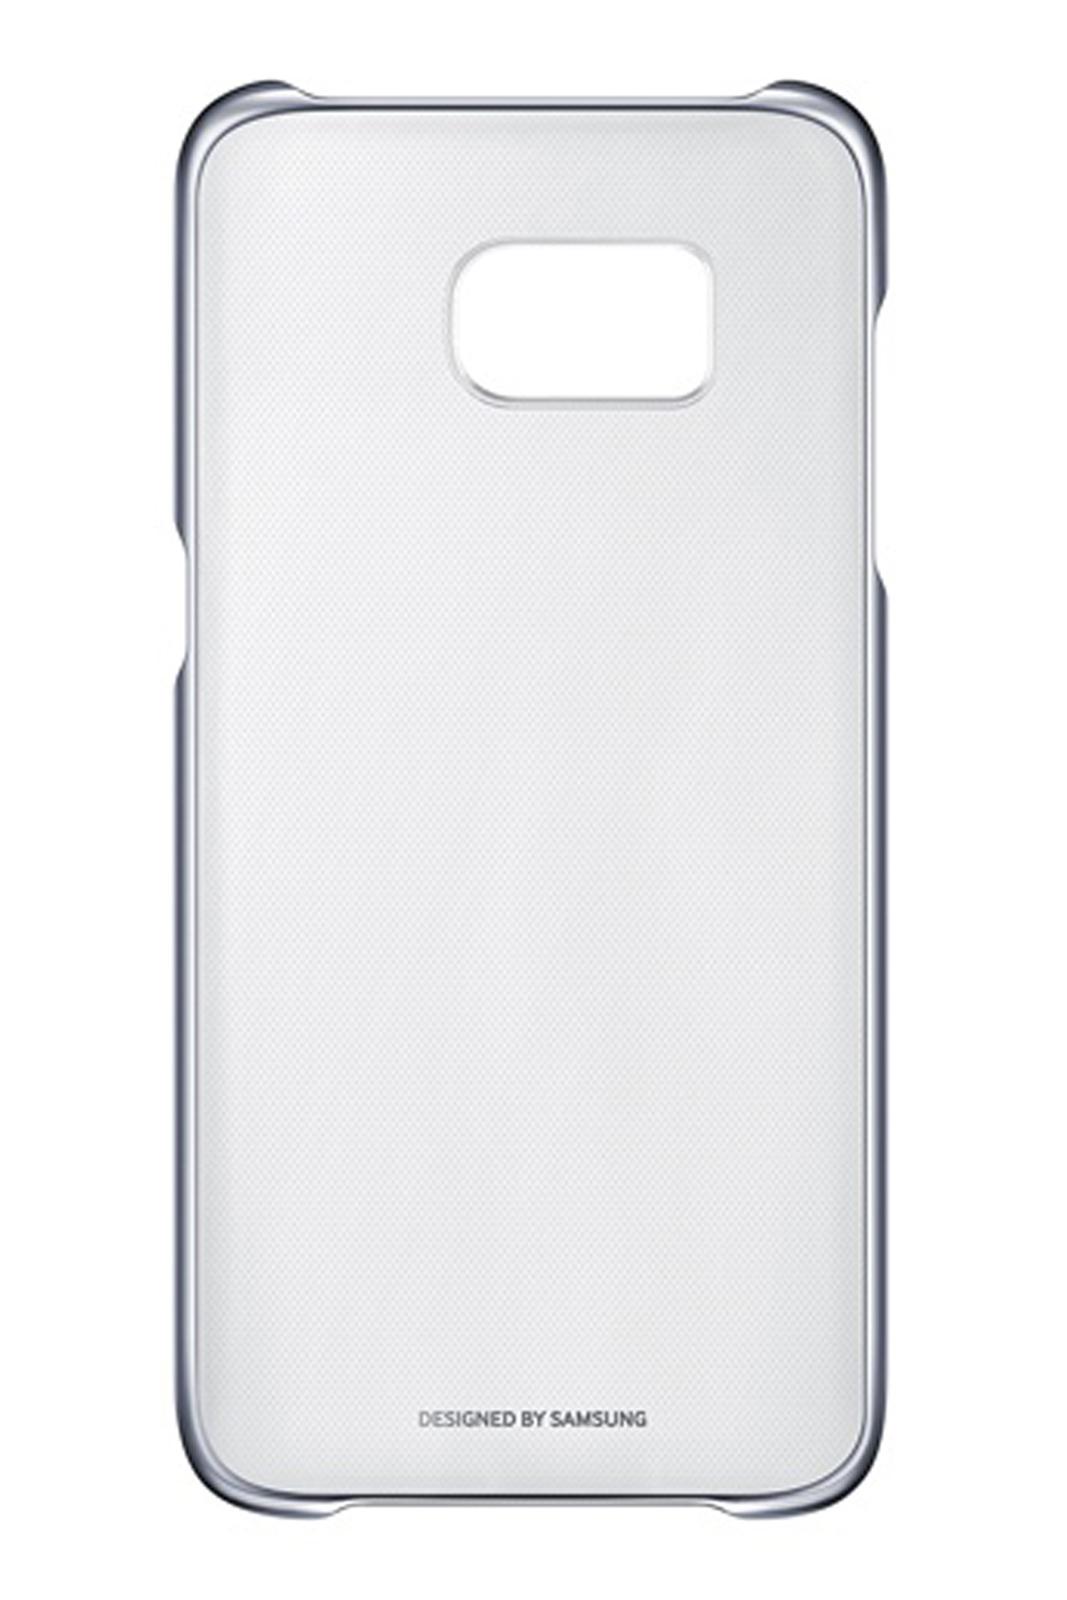 e228060cd82 Official Samsung Galaxy S7 Edge Black Clear Cover - EF-QG935CBEGWW ...